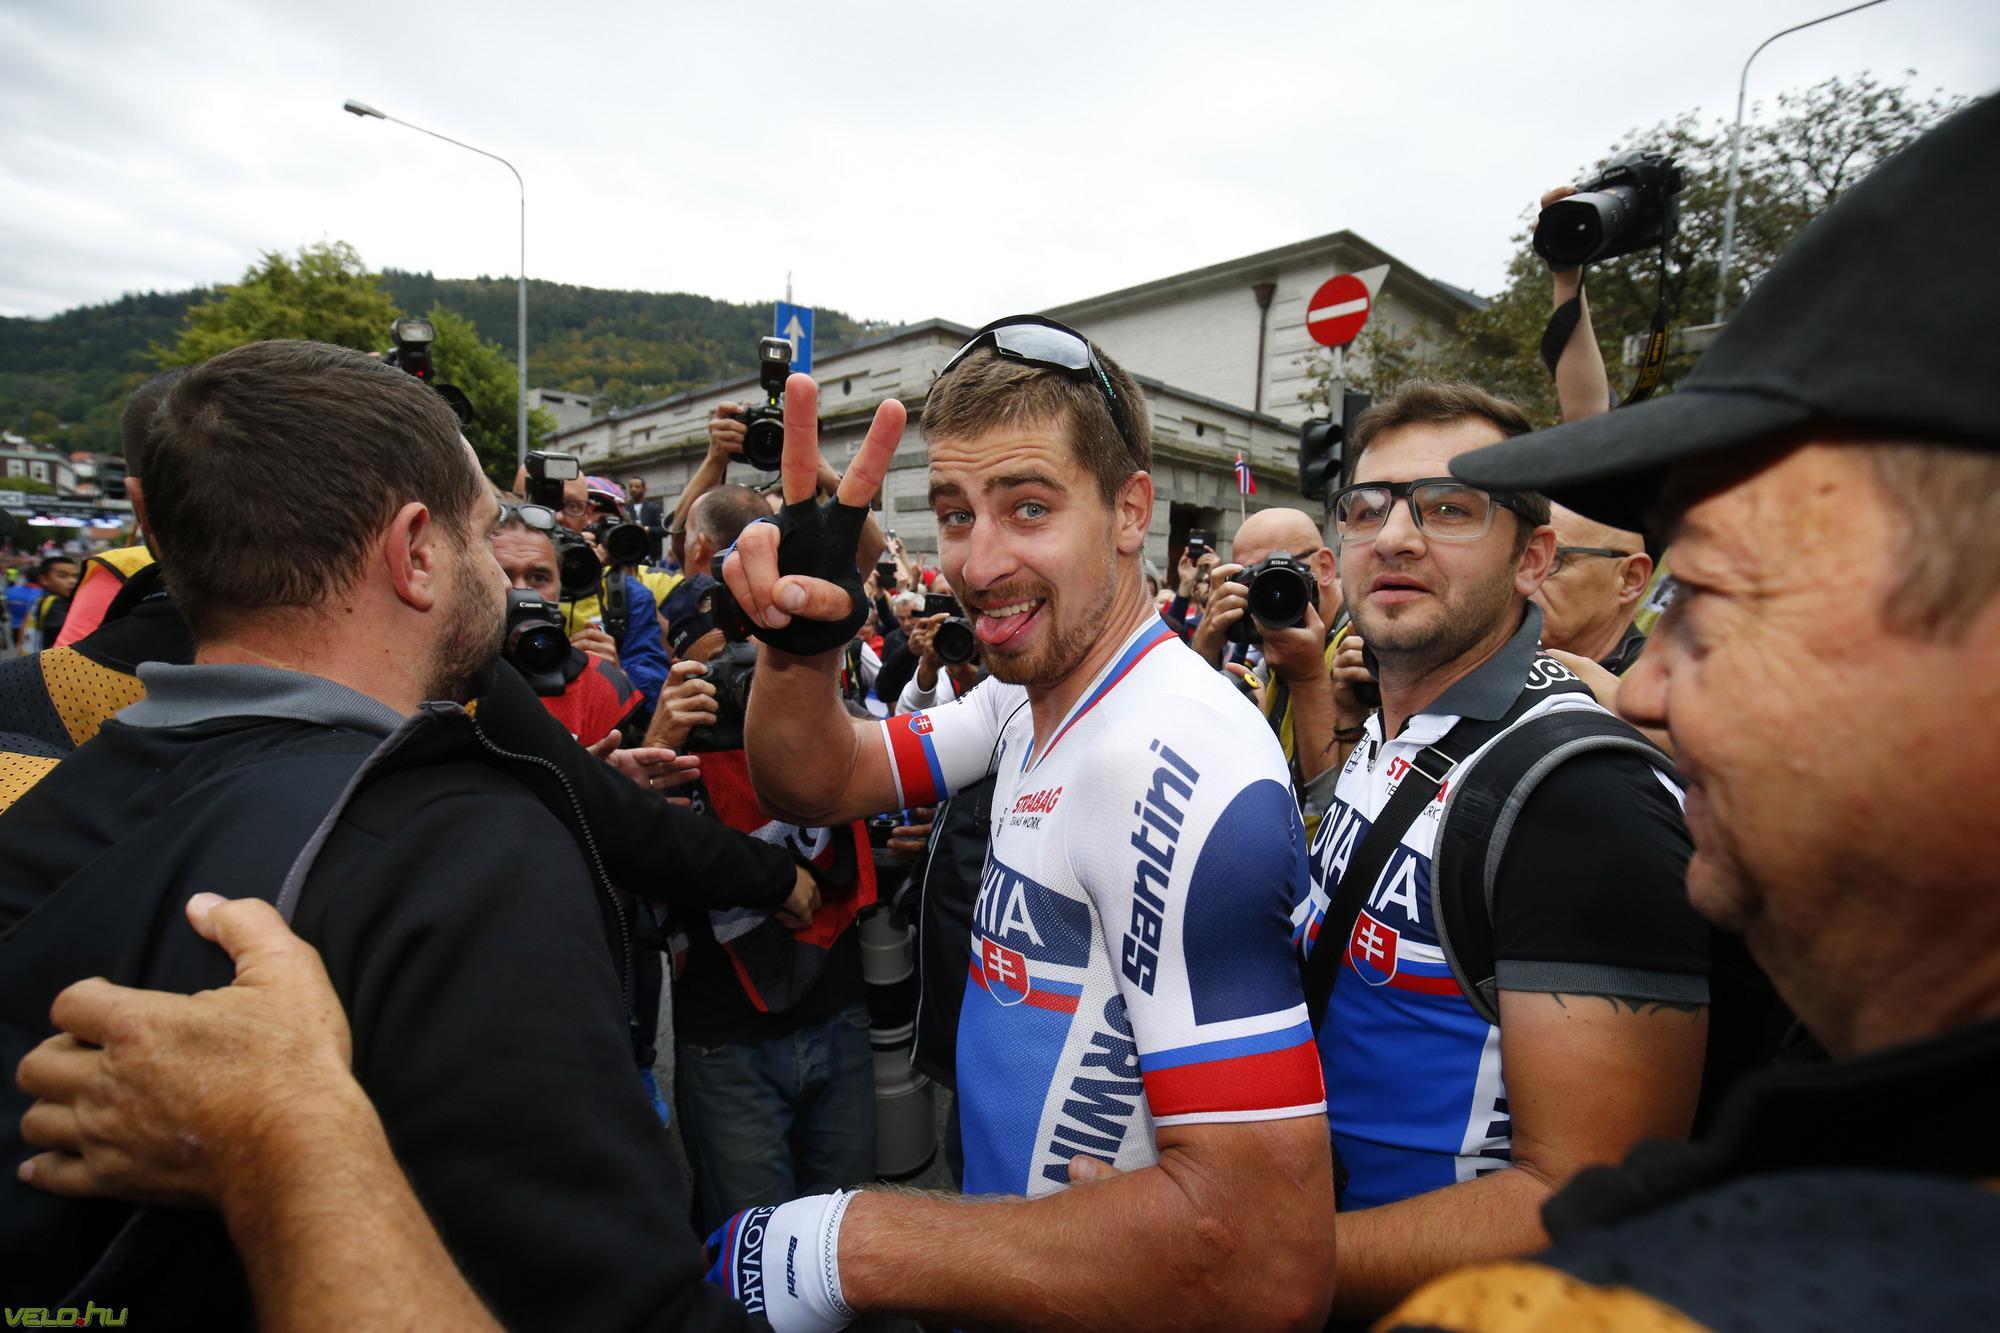 Peter Sagan ismét világbajnok!